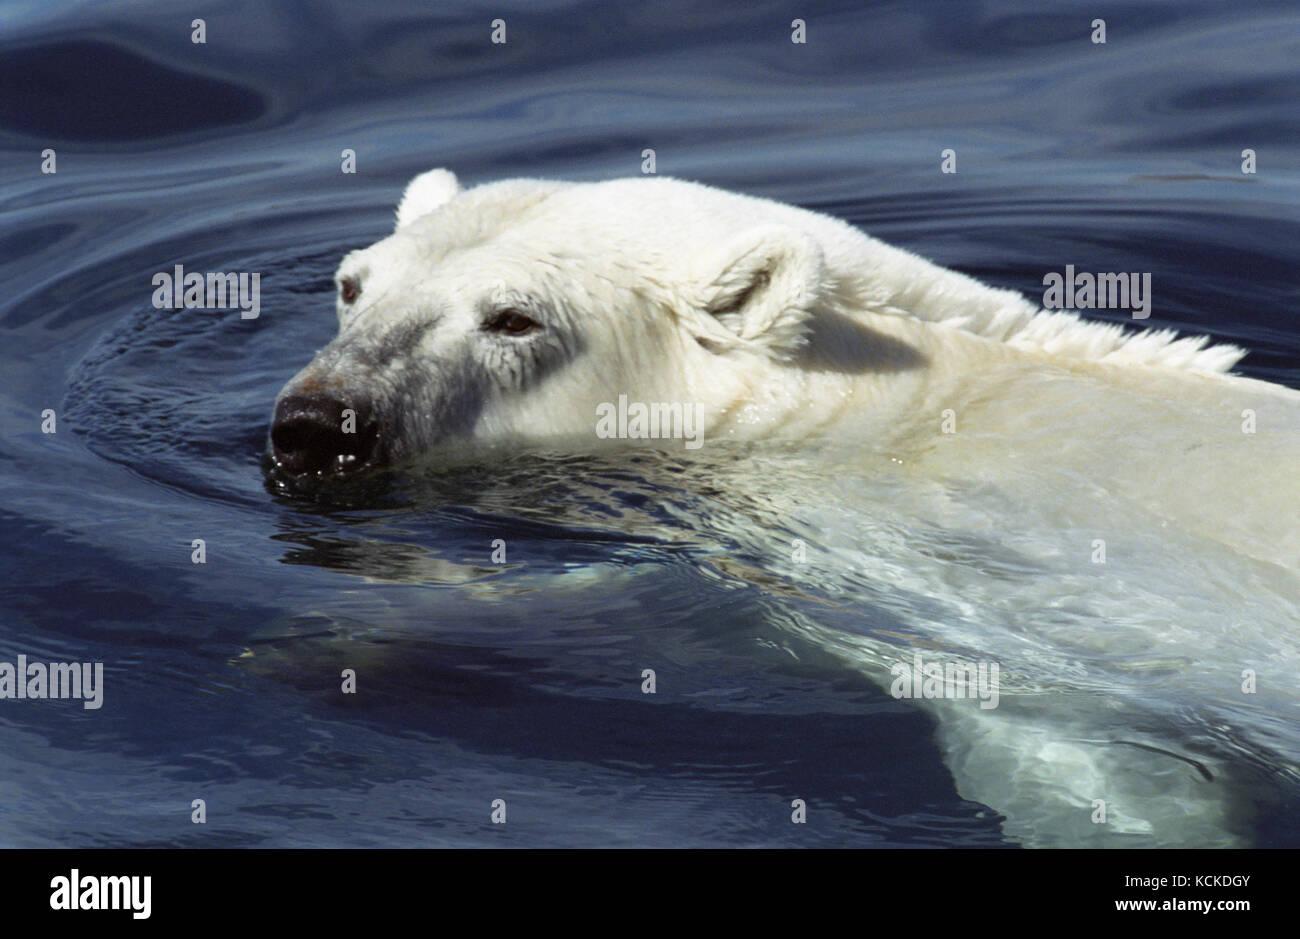 Polar bear, Ursus maritimus, swims in Wager Bay, Ukkusiksalik National Park, Nunavut, Canada - Stock Image